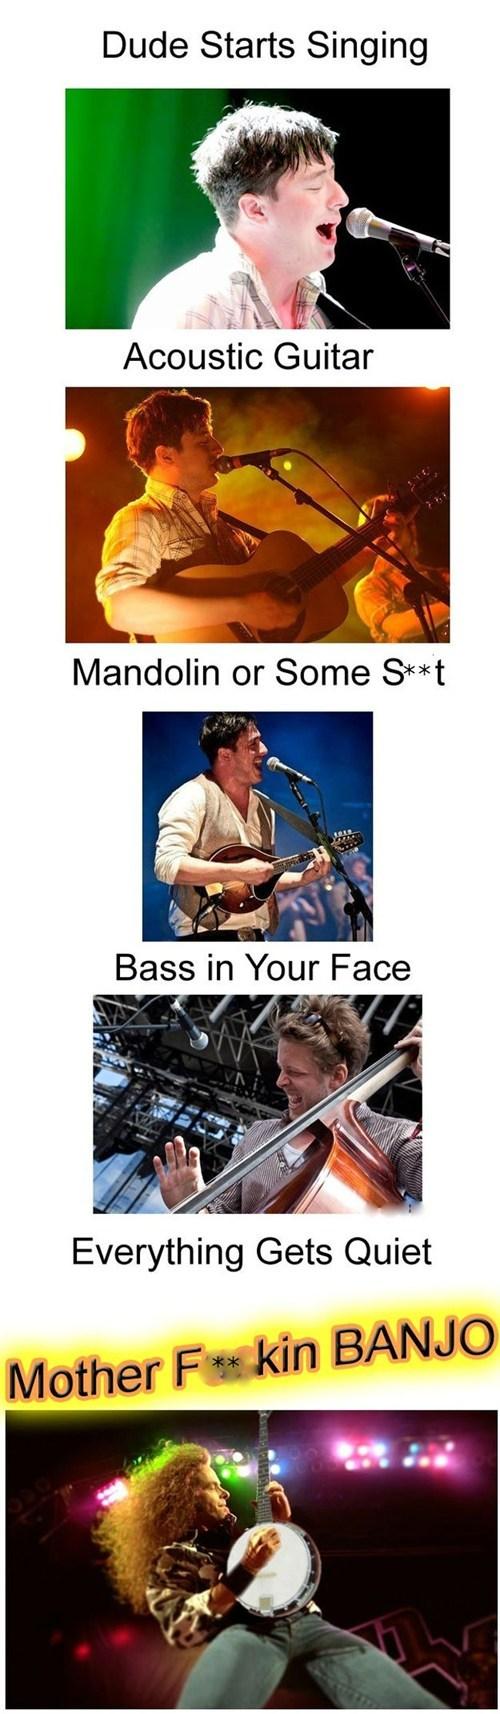 banjo Music FAILS - 7264897280